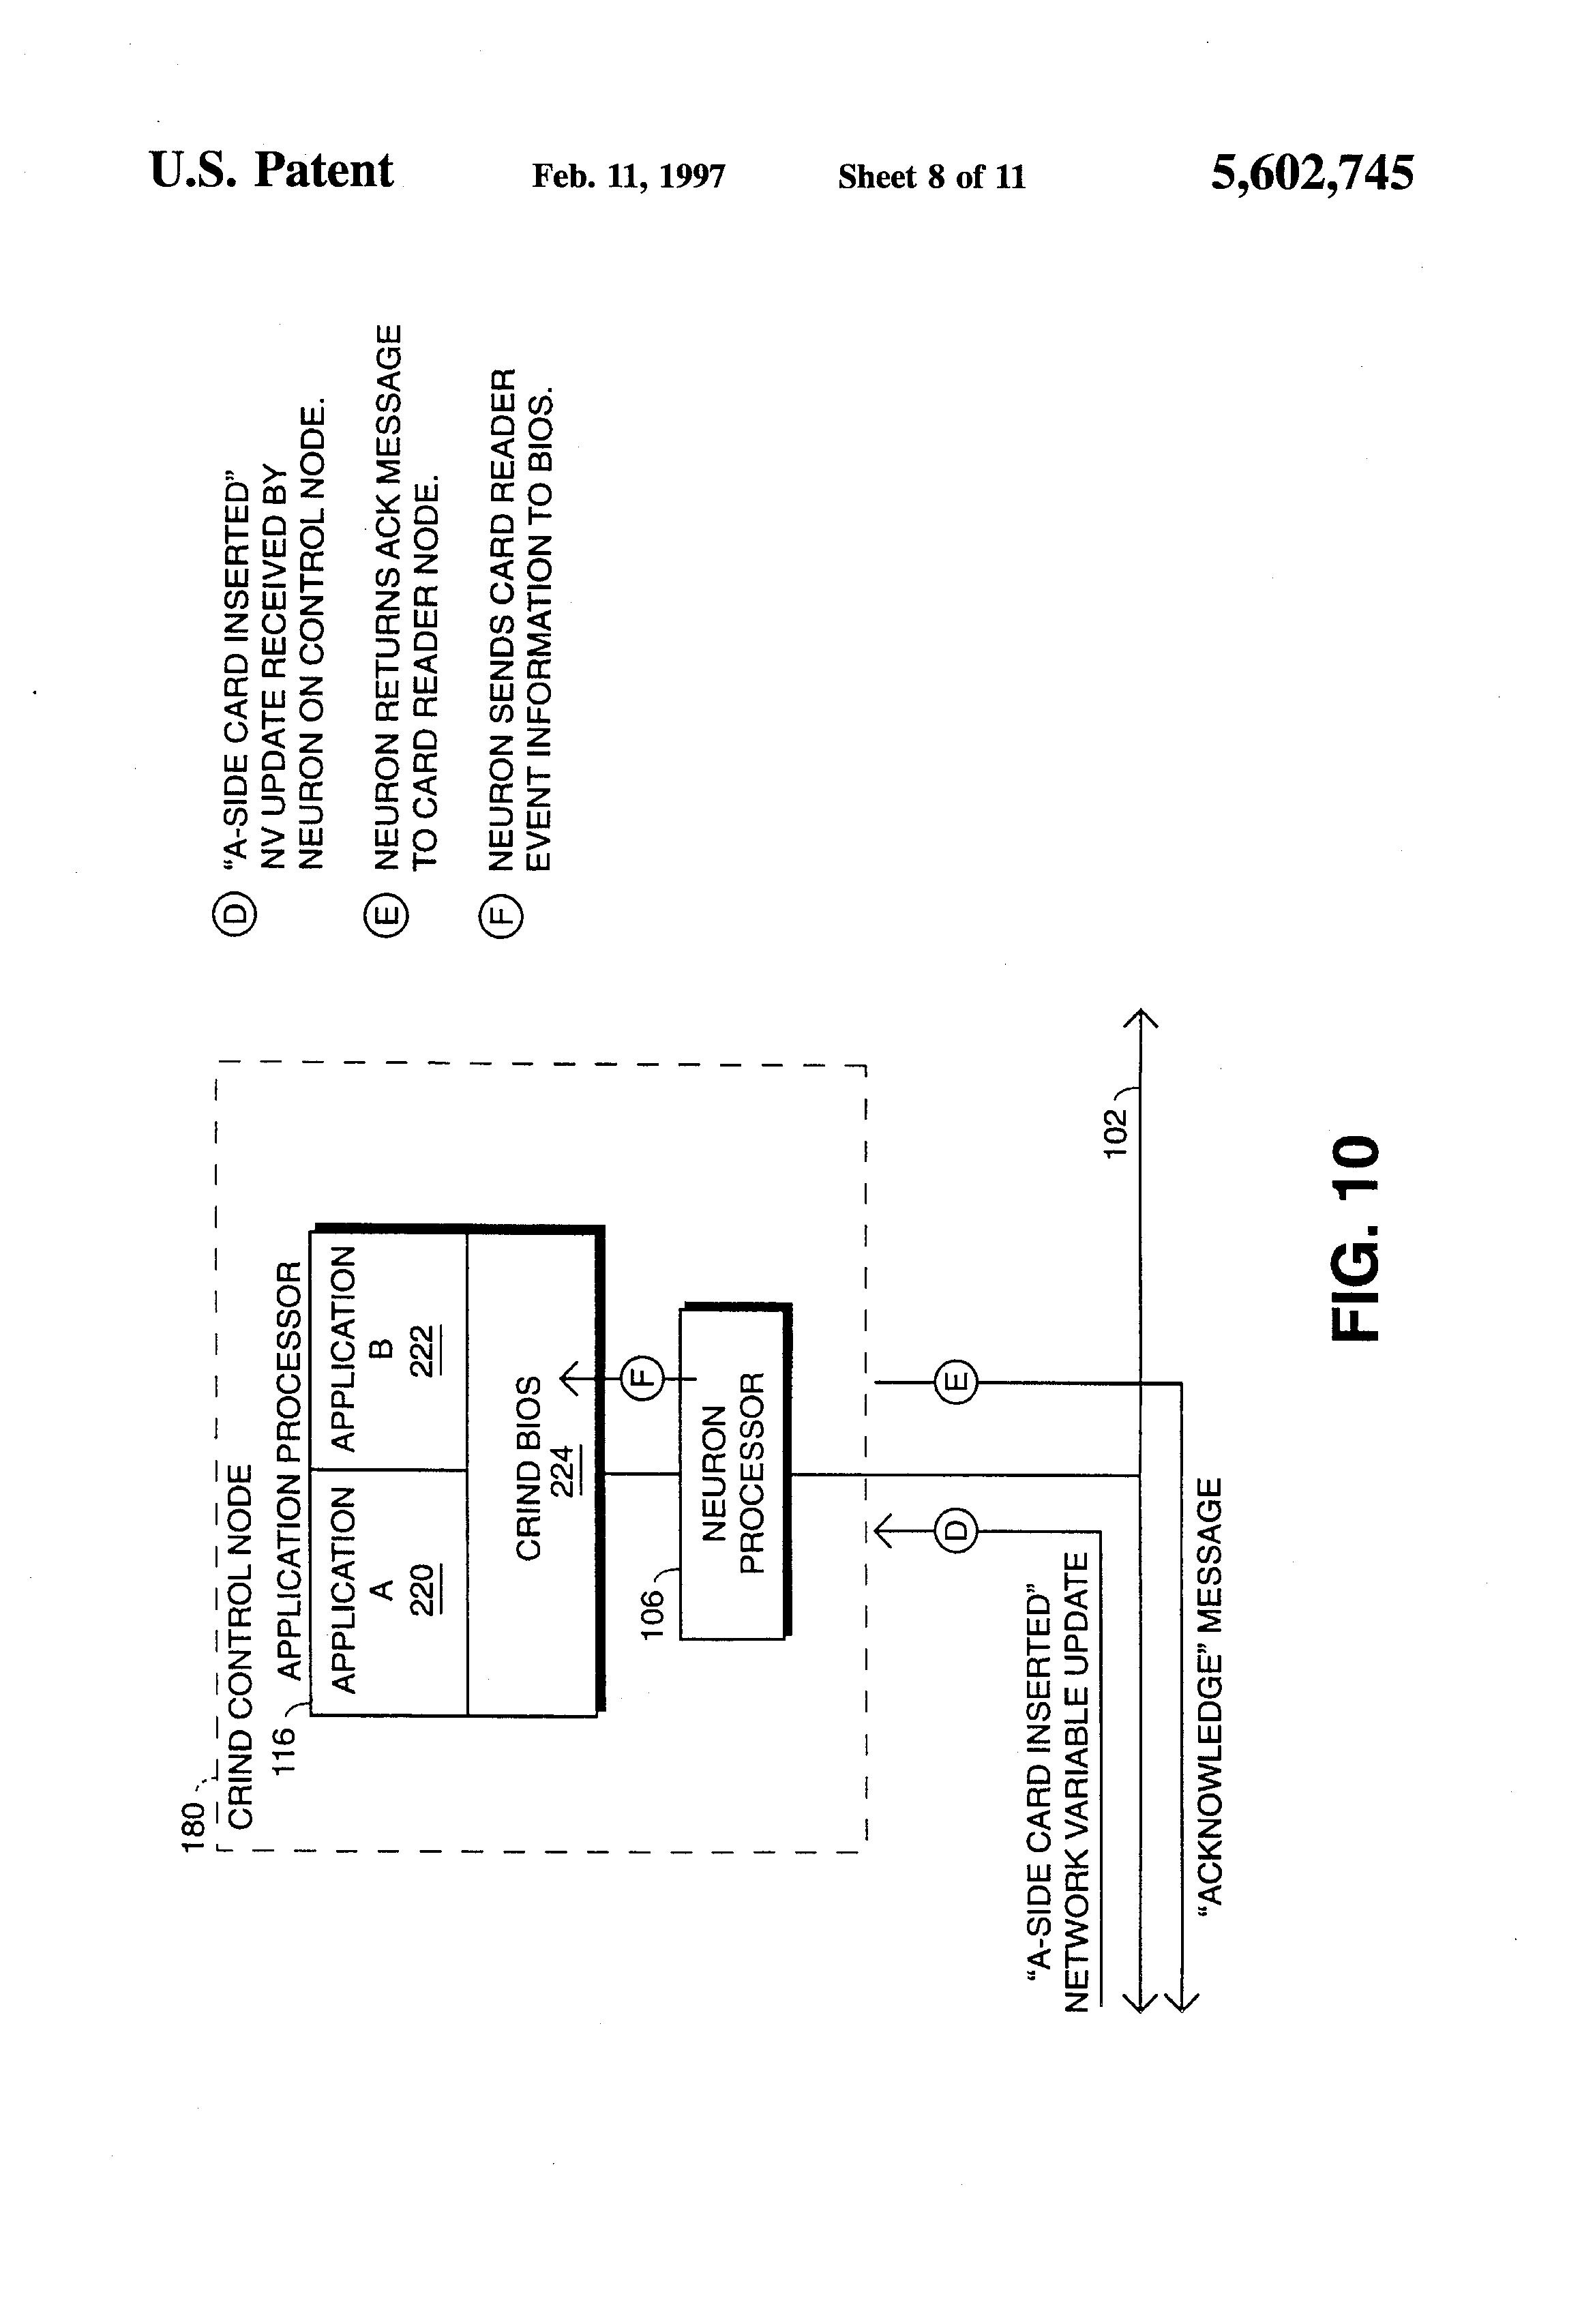 Tokheim 262a Wiring Diagram. . Wiring Diagram on